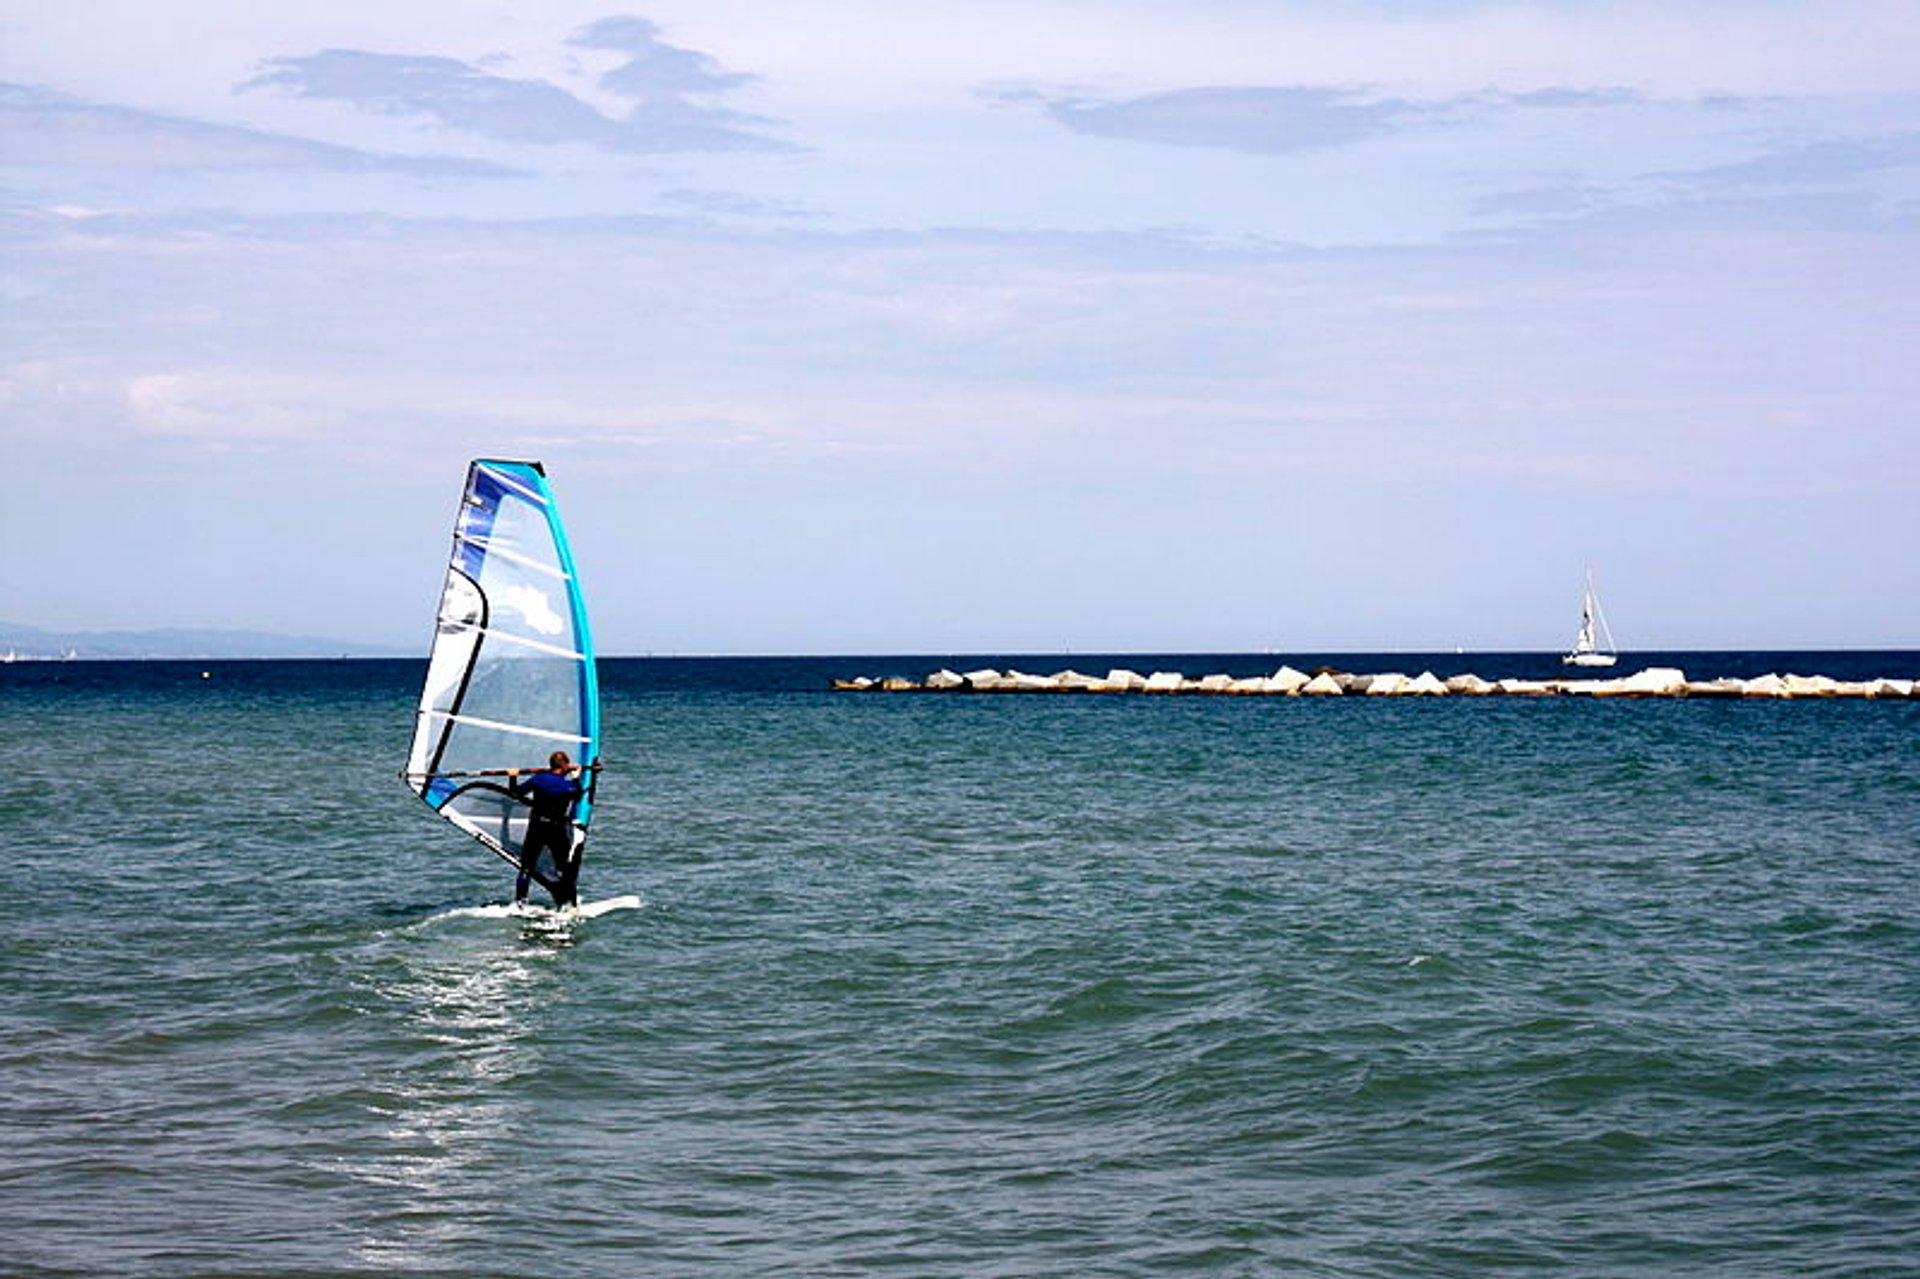 Kitesurfing and Windsurfing  in Barcelona - Best Season 2020